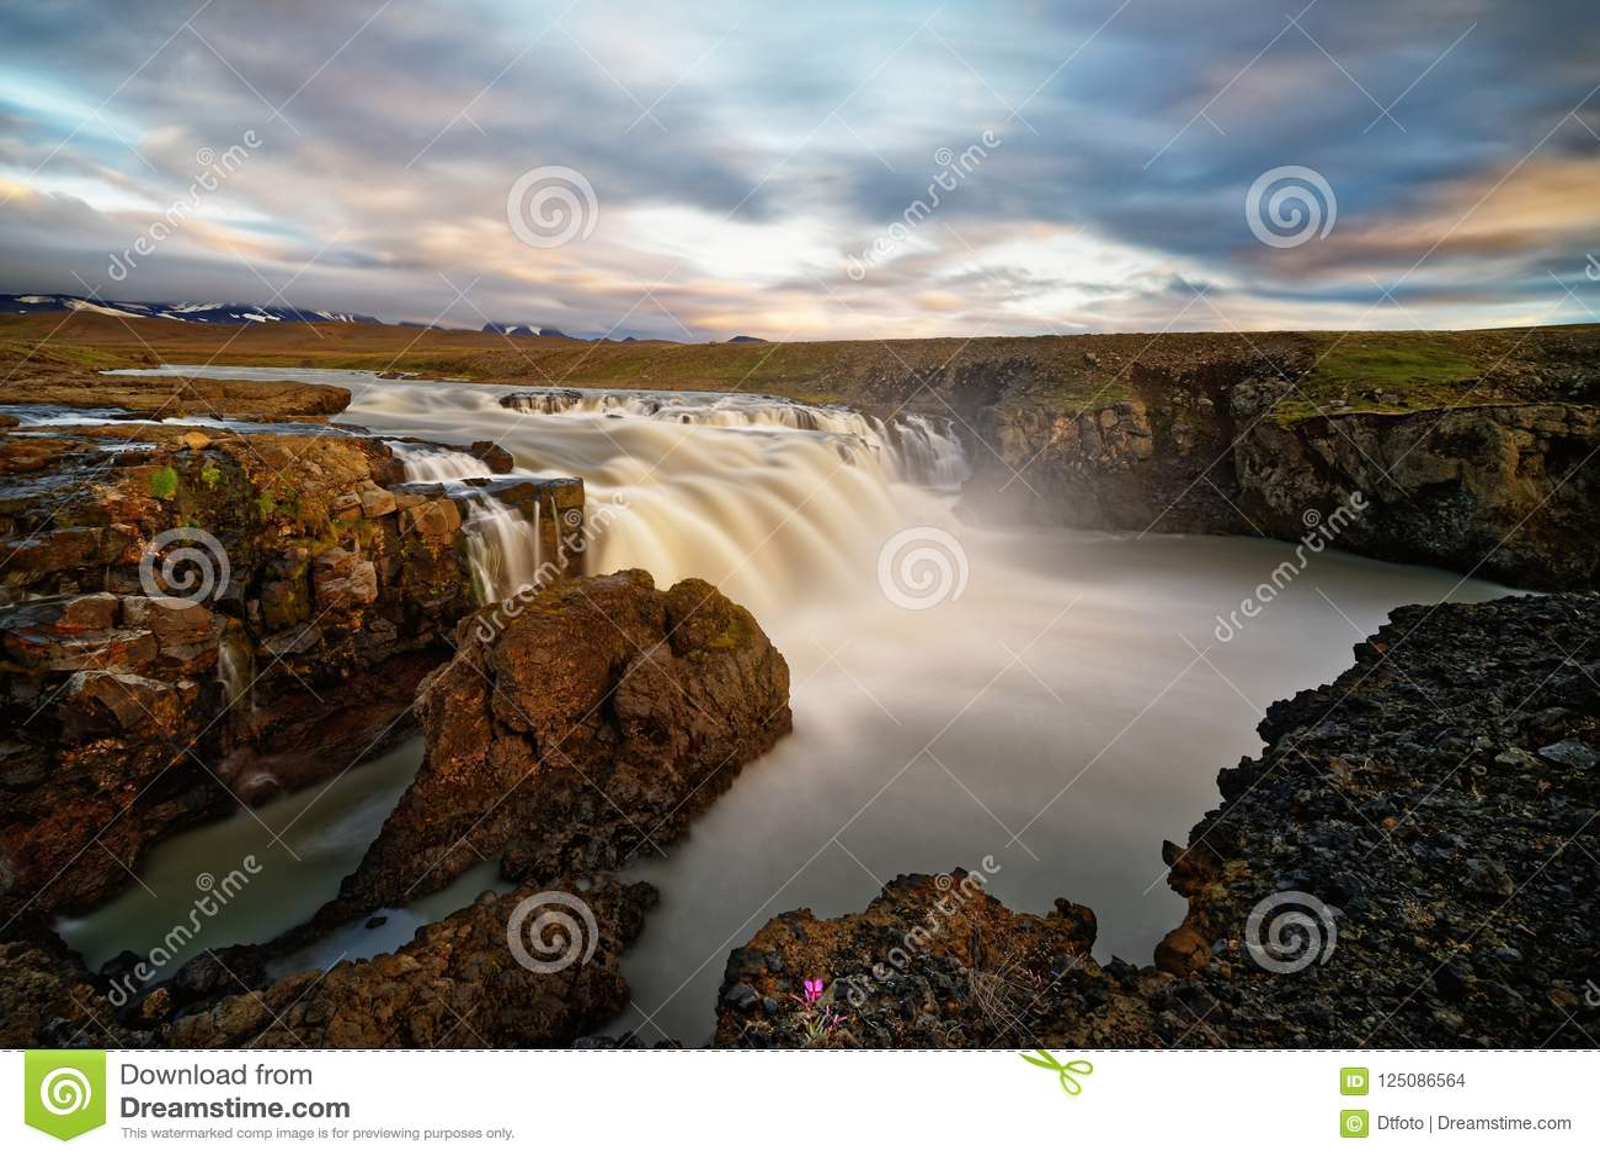 Водопад в одичалом ландшафте в свете вечера